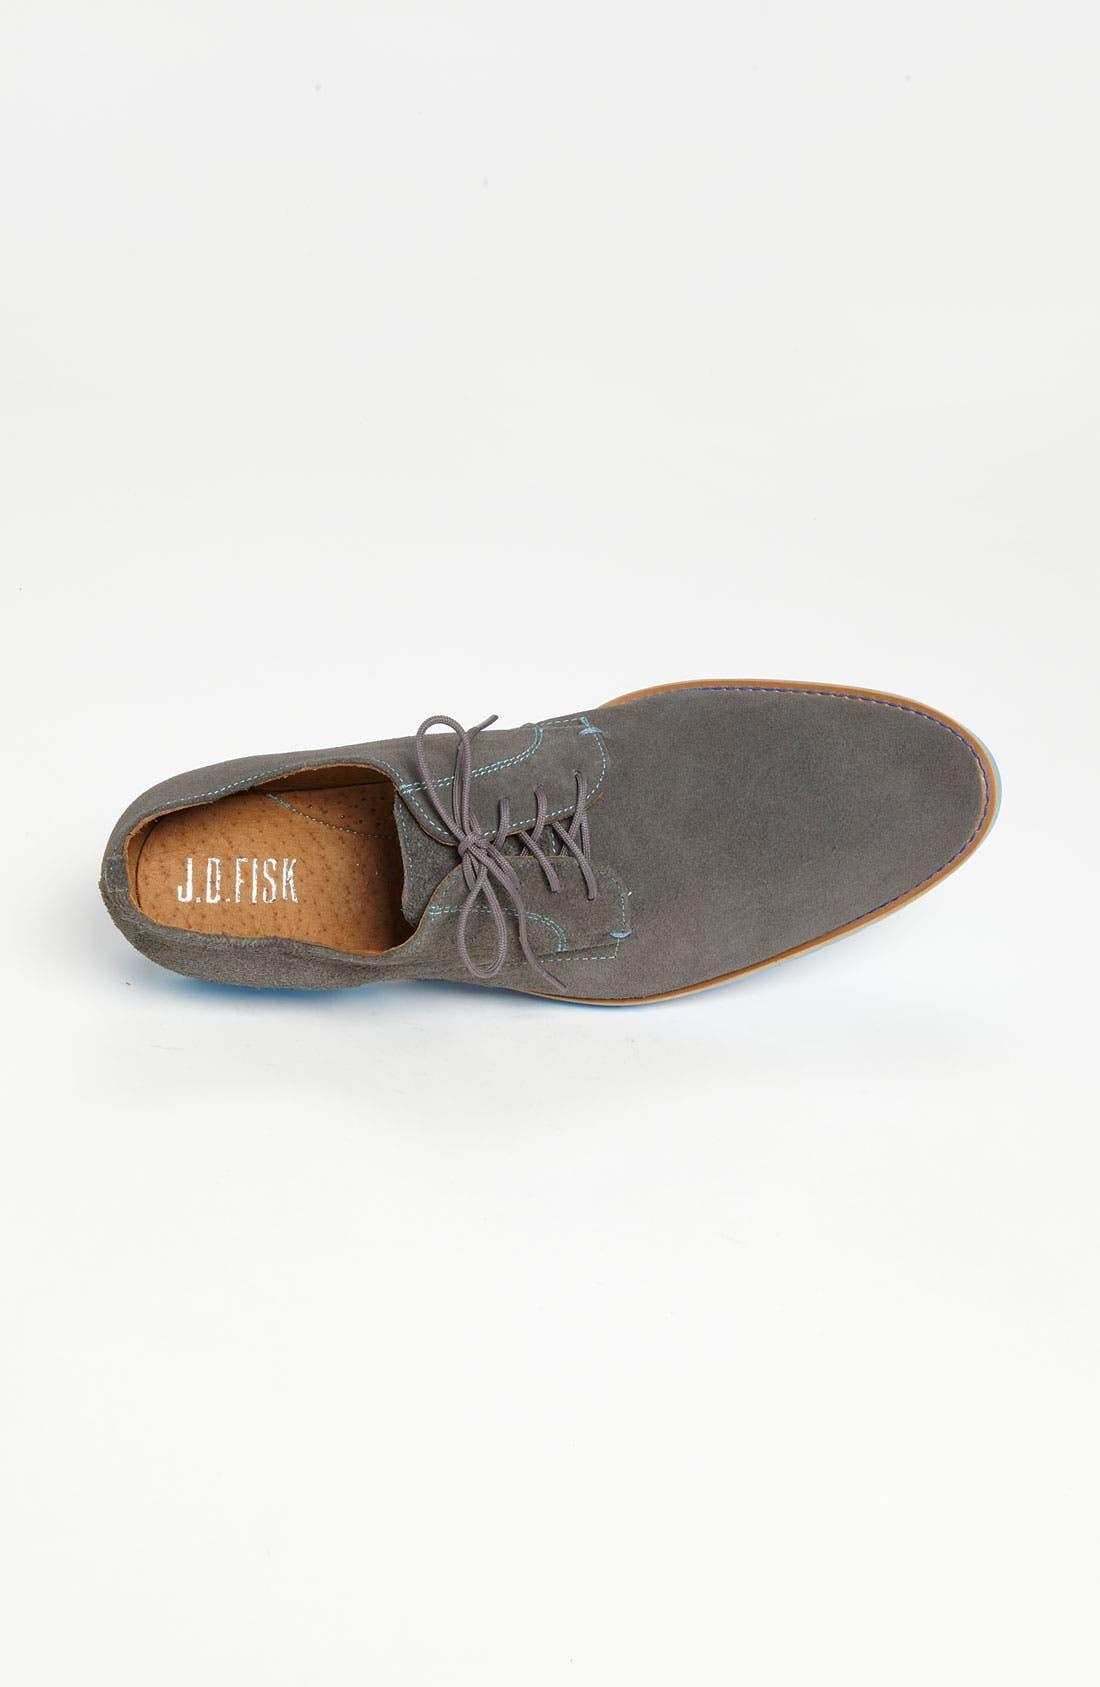 Alternate Image 3  - J.D. Fisk 'Virago' Buck Shoe